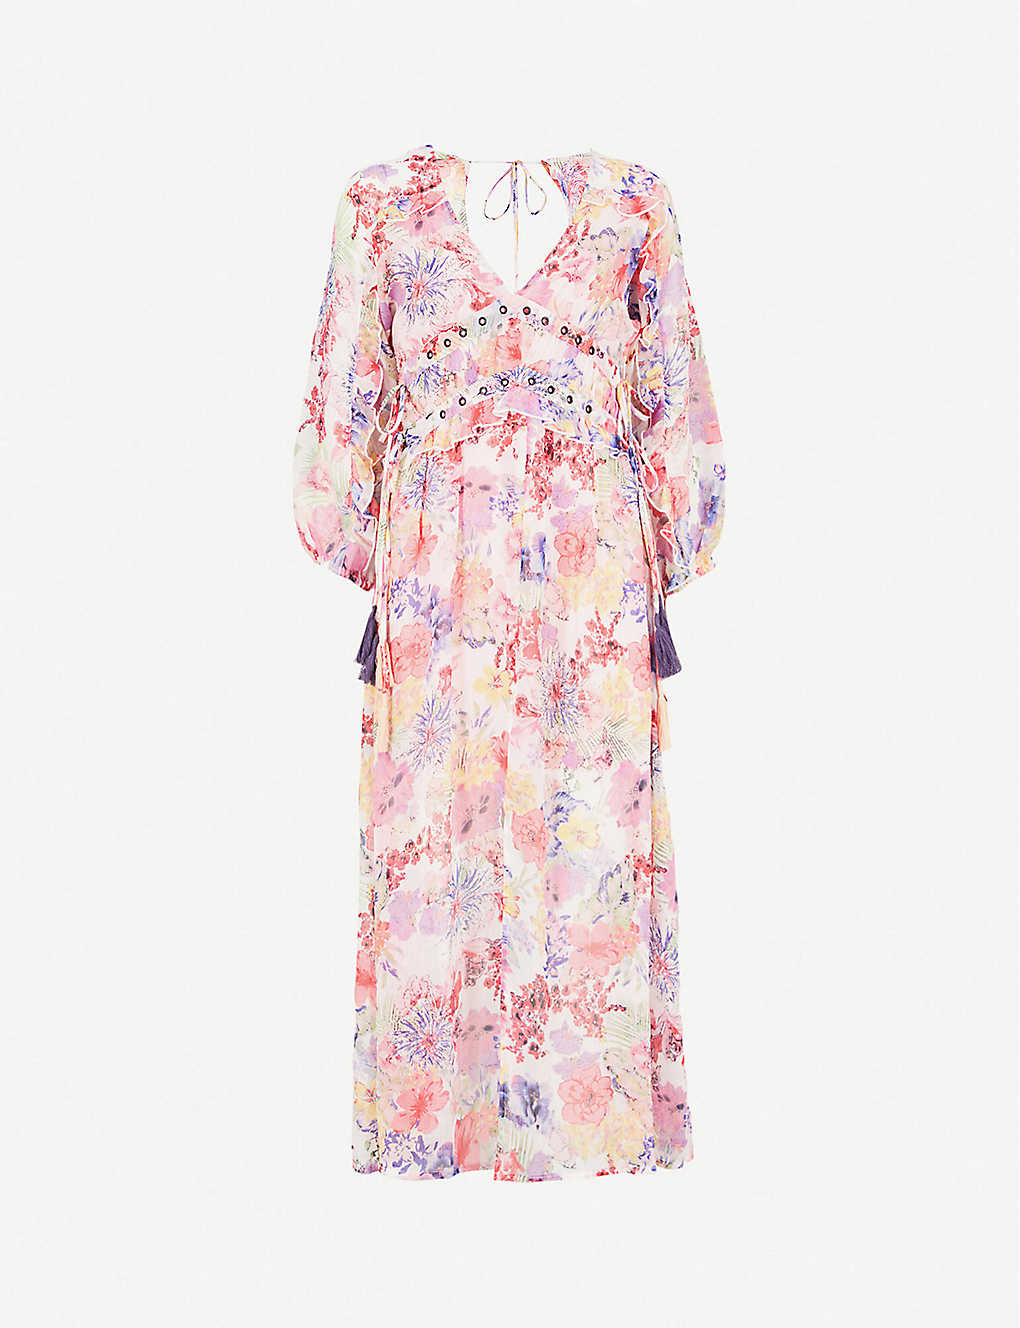 76b0d476a8b Wispy Floral Print Midi Dress - Gomes Weine AG